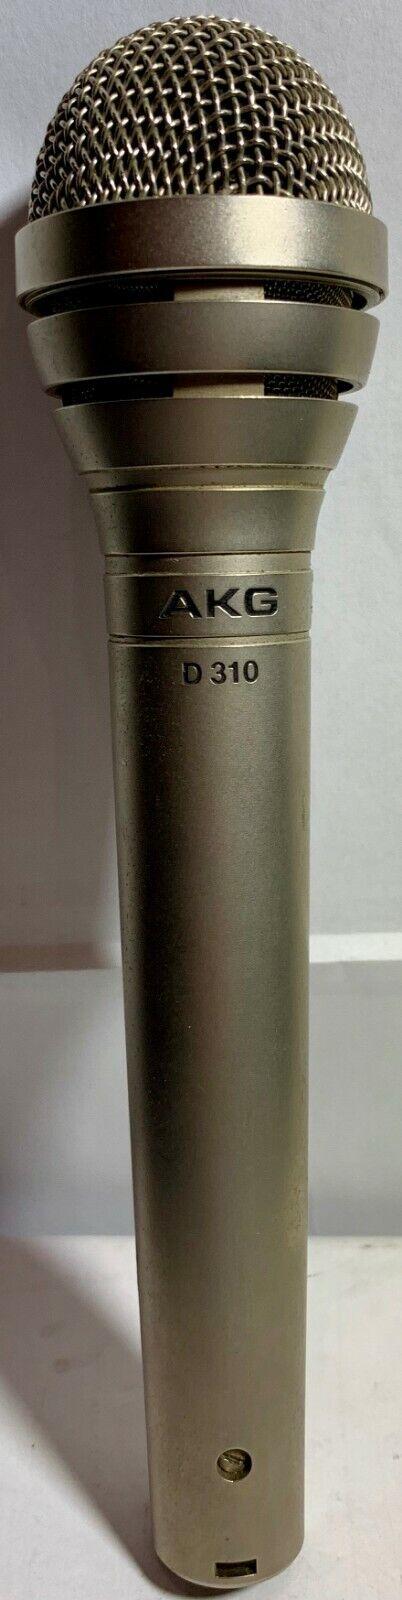 AKG D310 Vintage Dynamic Cardioid Mikrofon